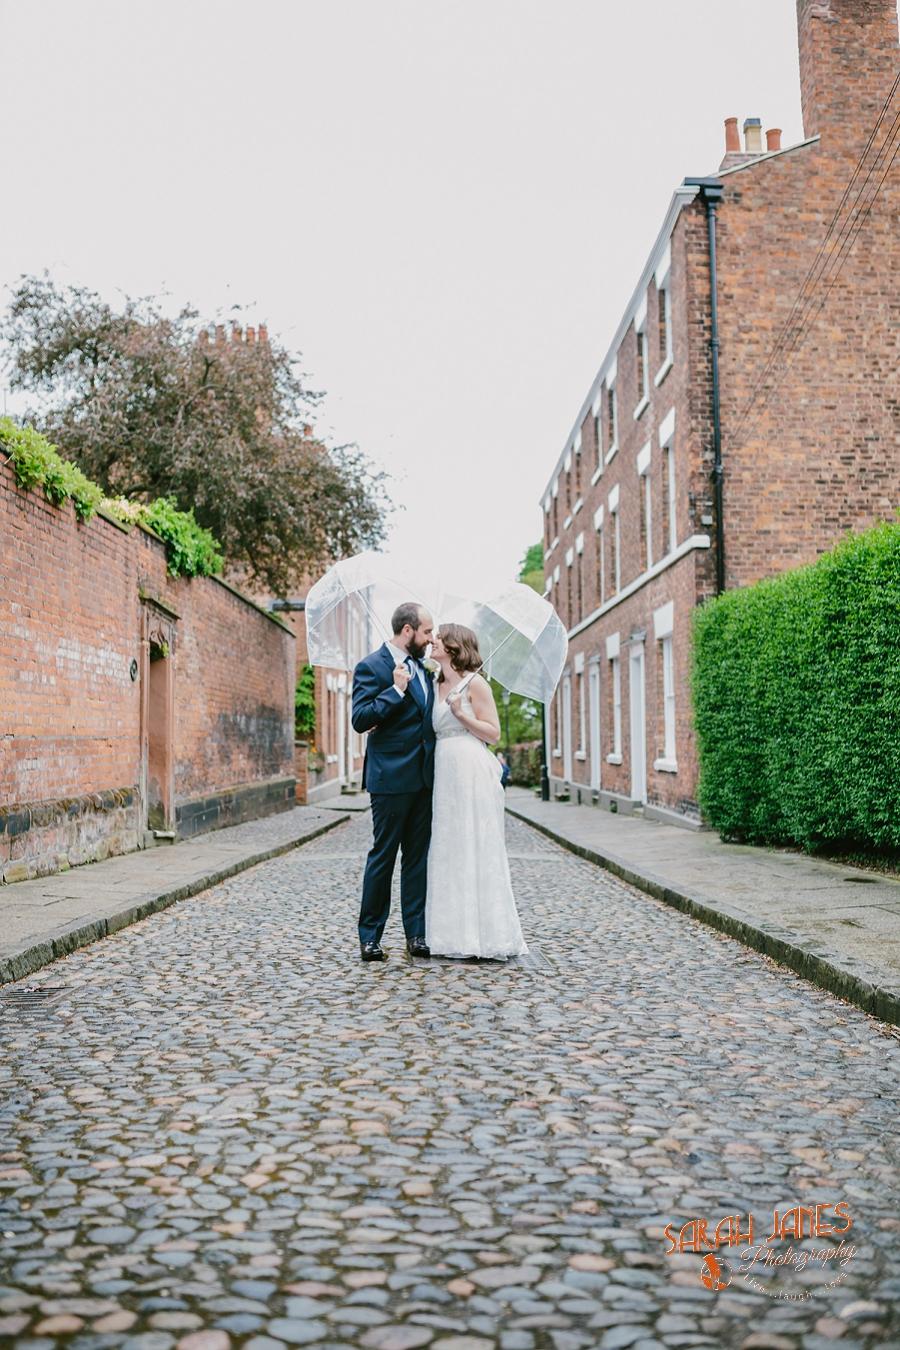 Sarah Janes Photography, Eccleston Village hall wedding, Chester Town Hall wedding_0013.jpg